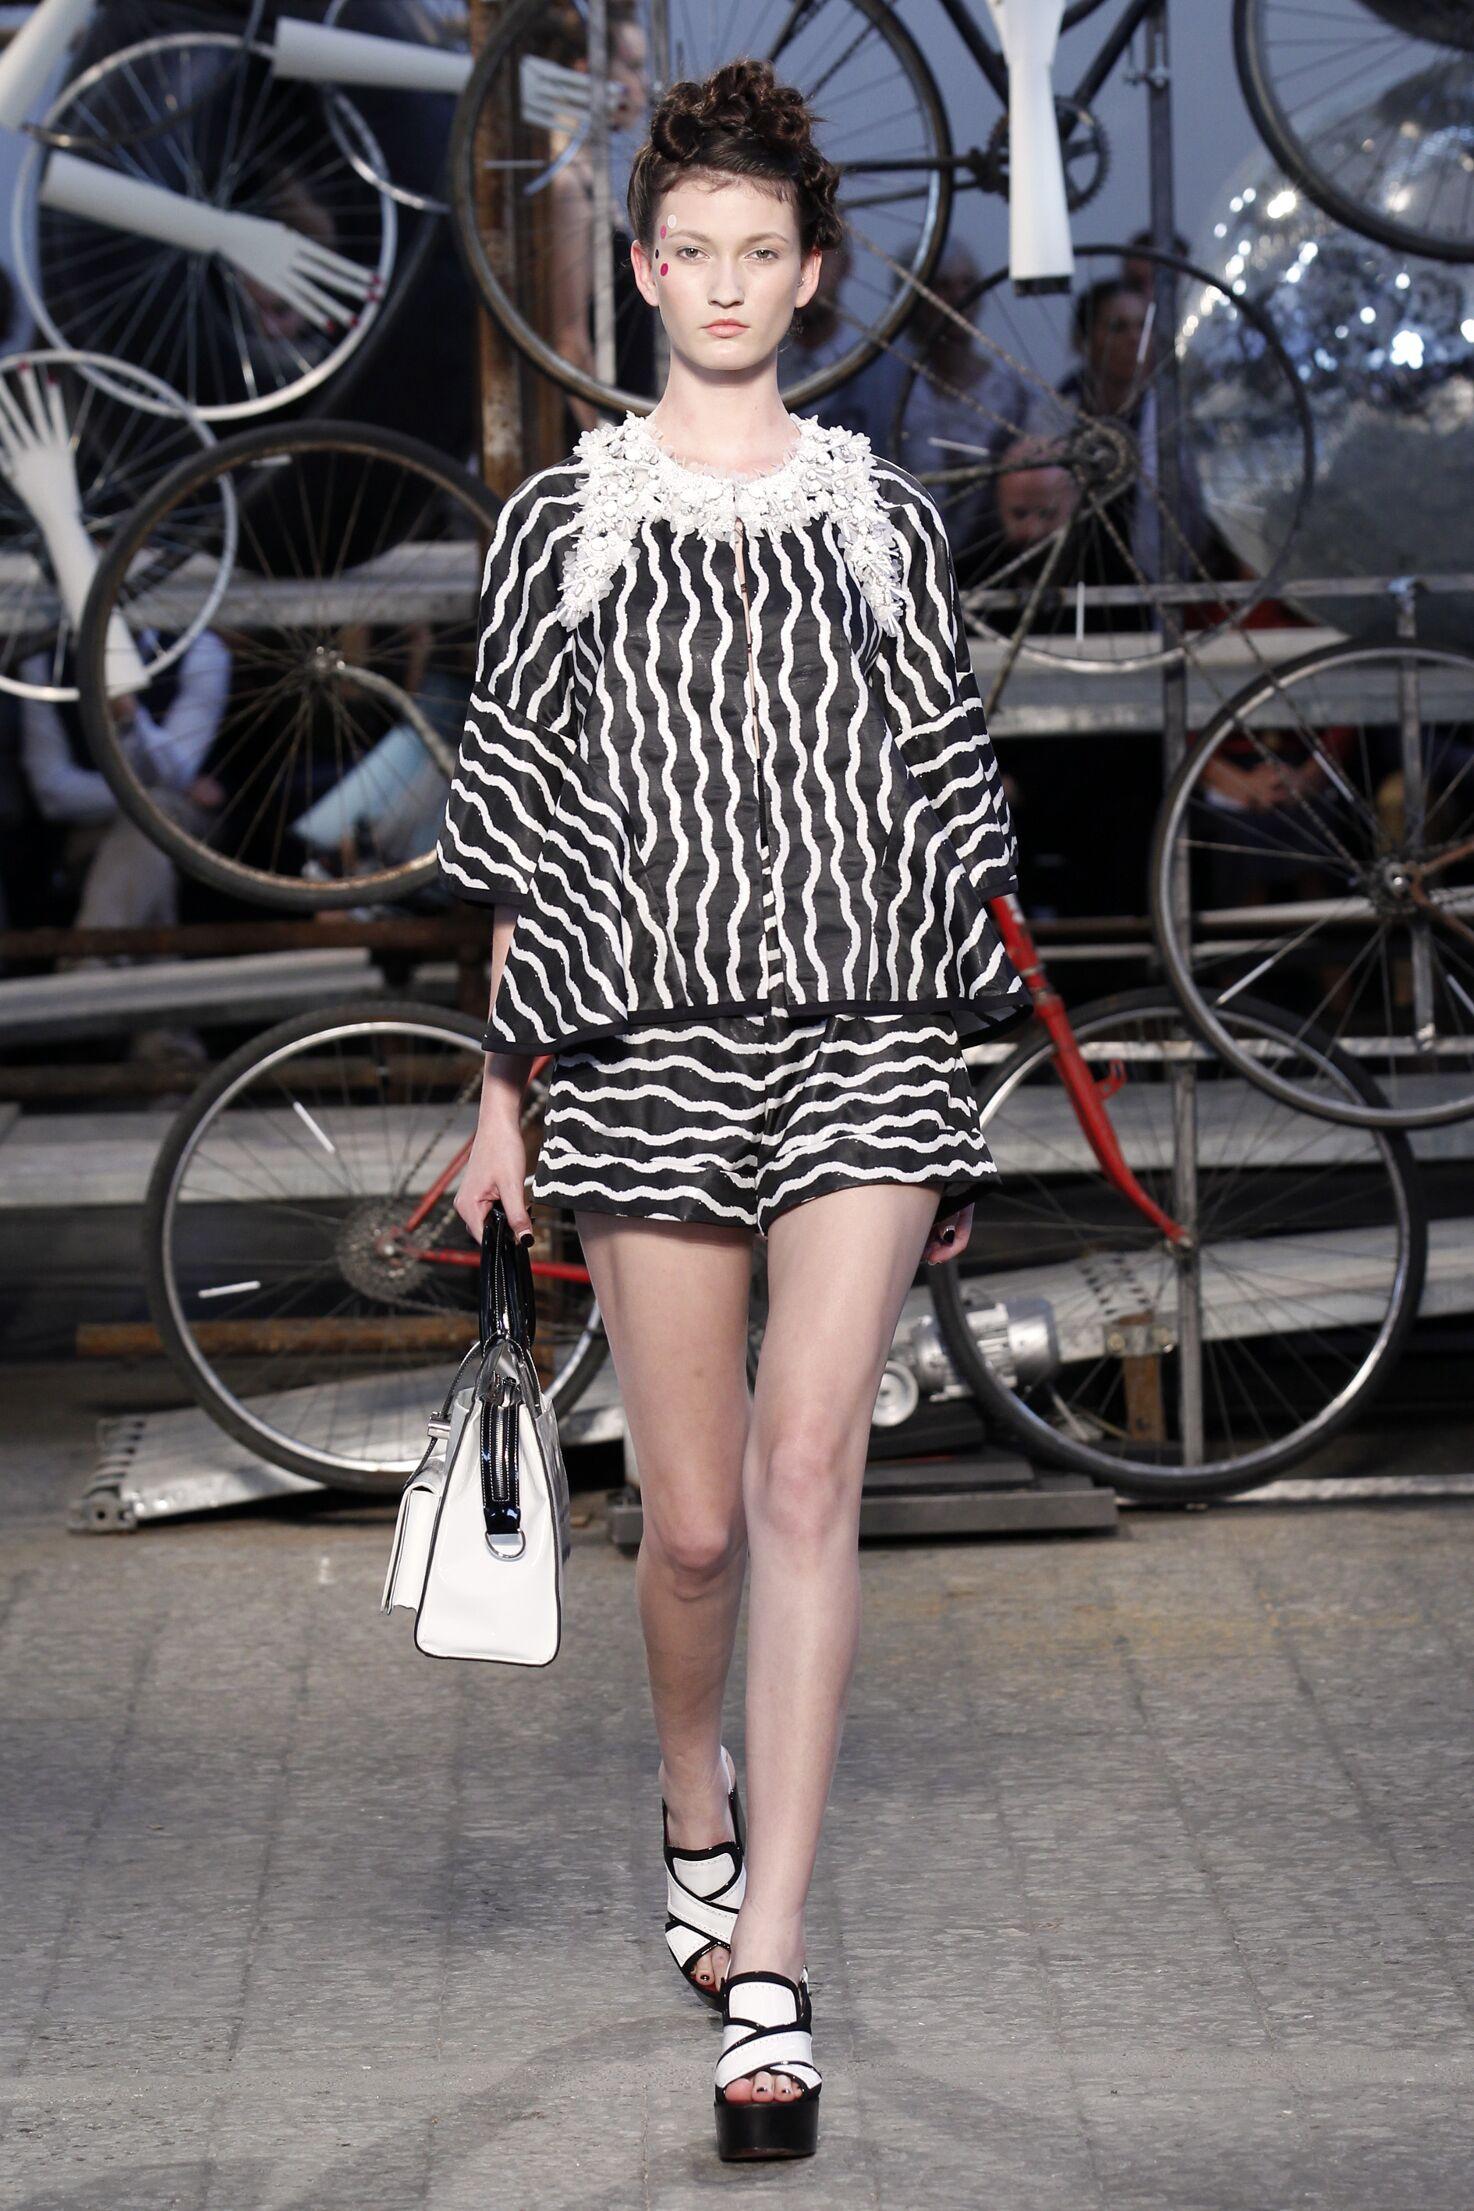 Antonio Marras Summer 2015 Catwalk Womenswear